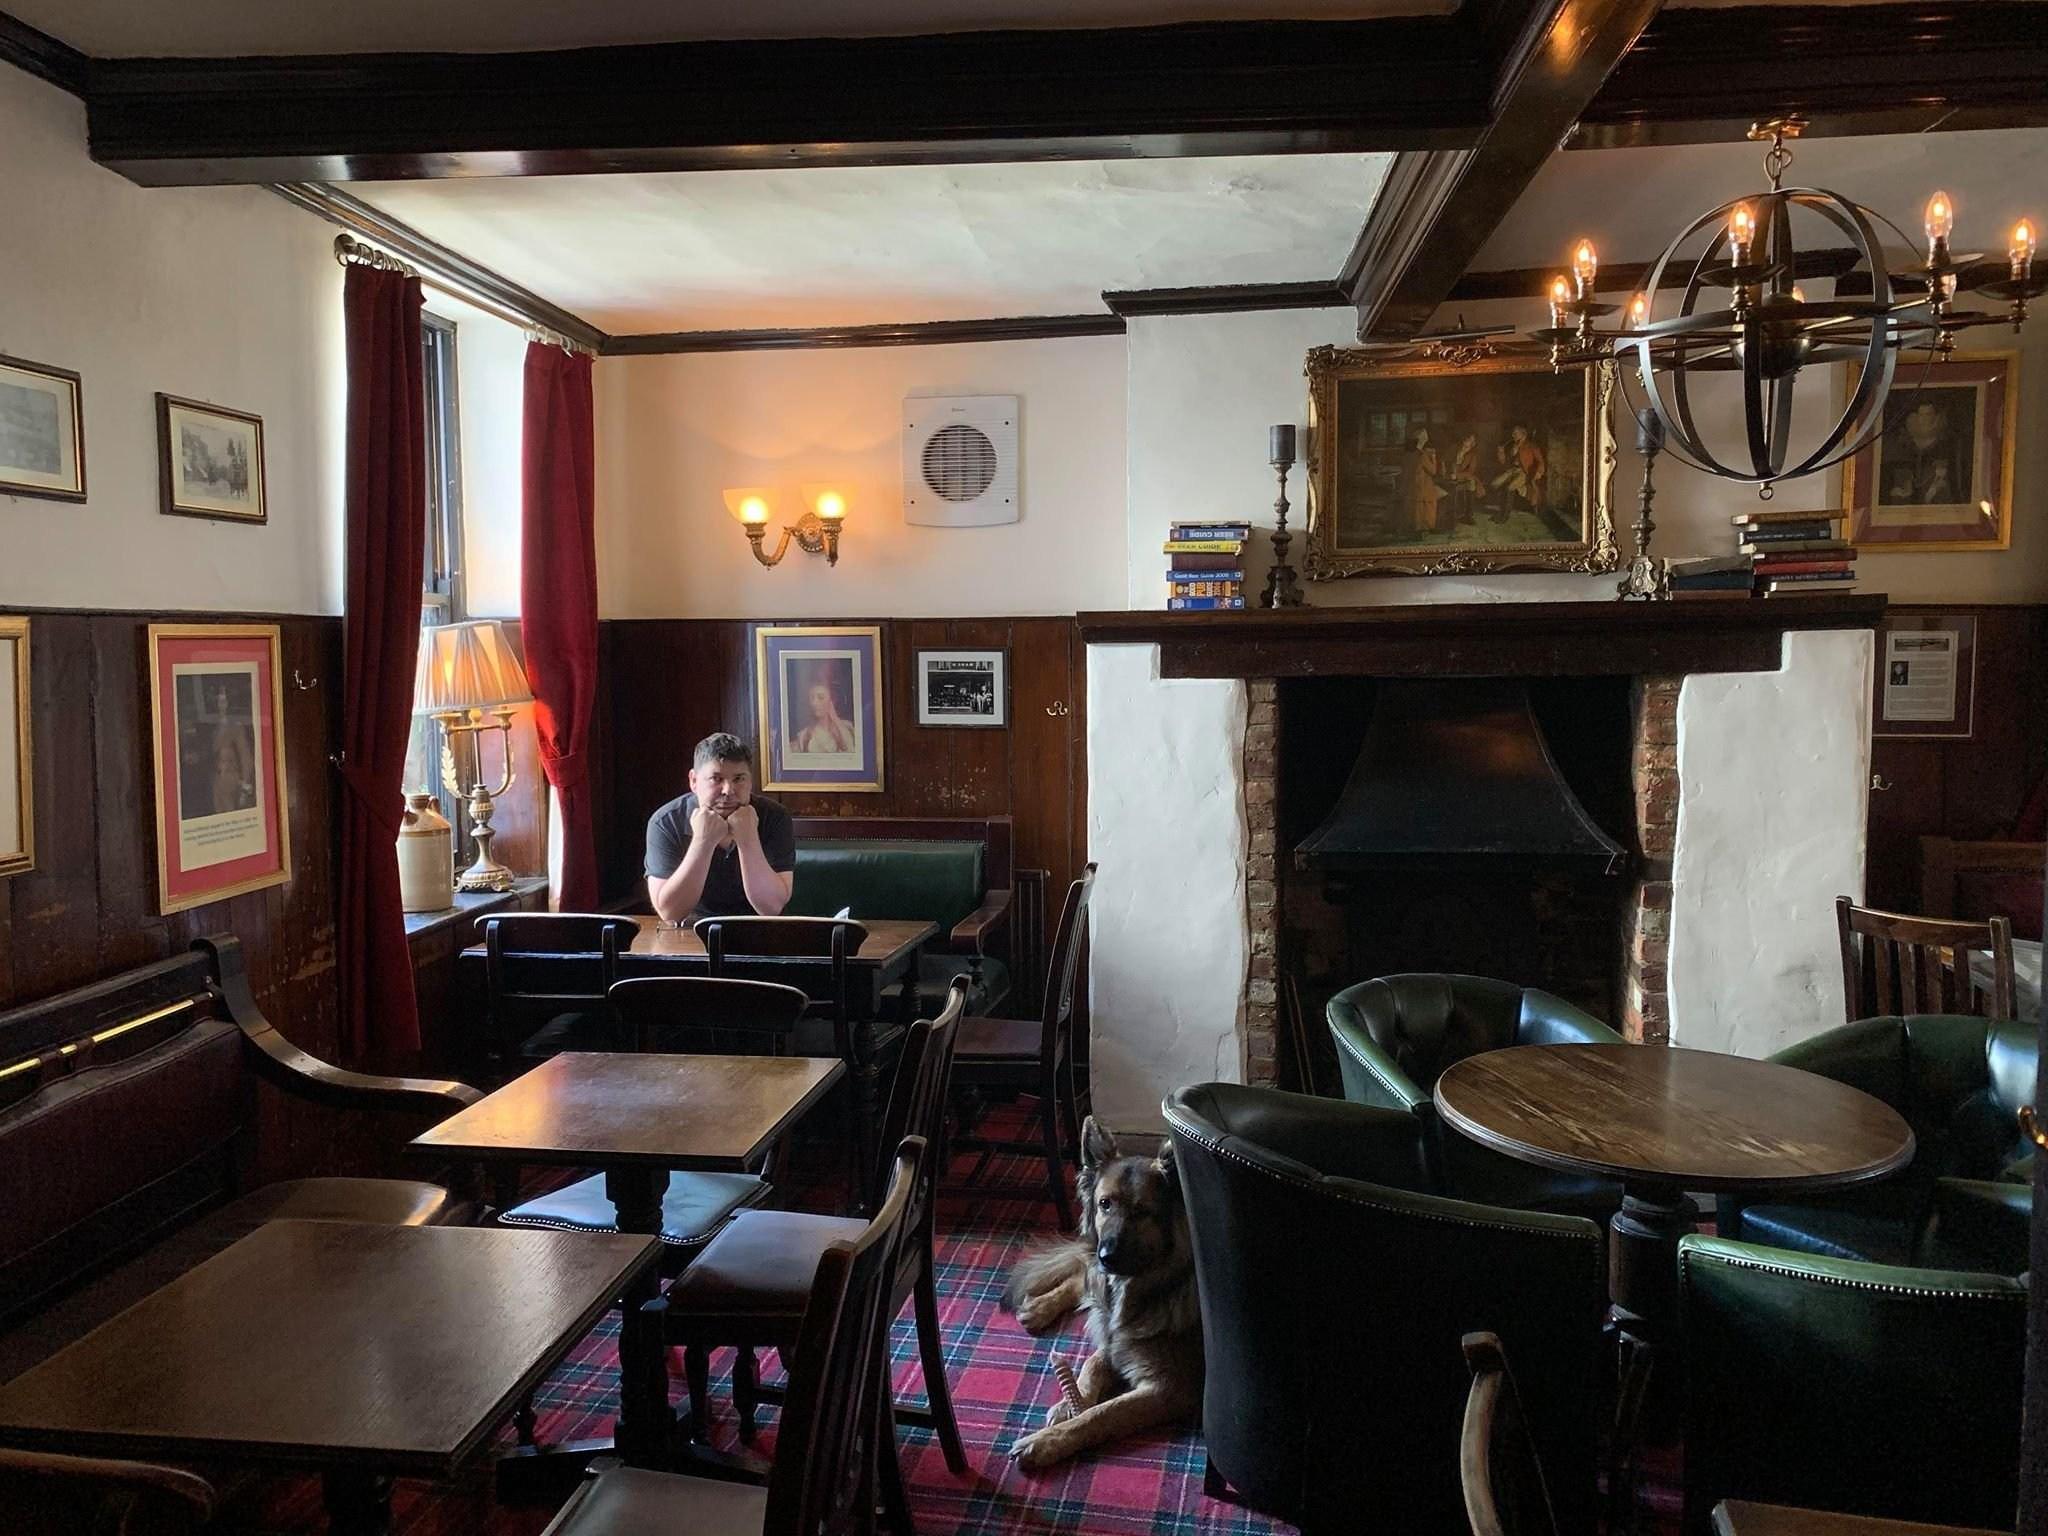 Pubs won't reopen unless breweries scrap rent